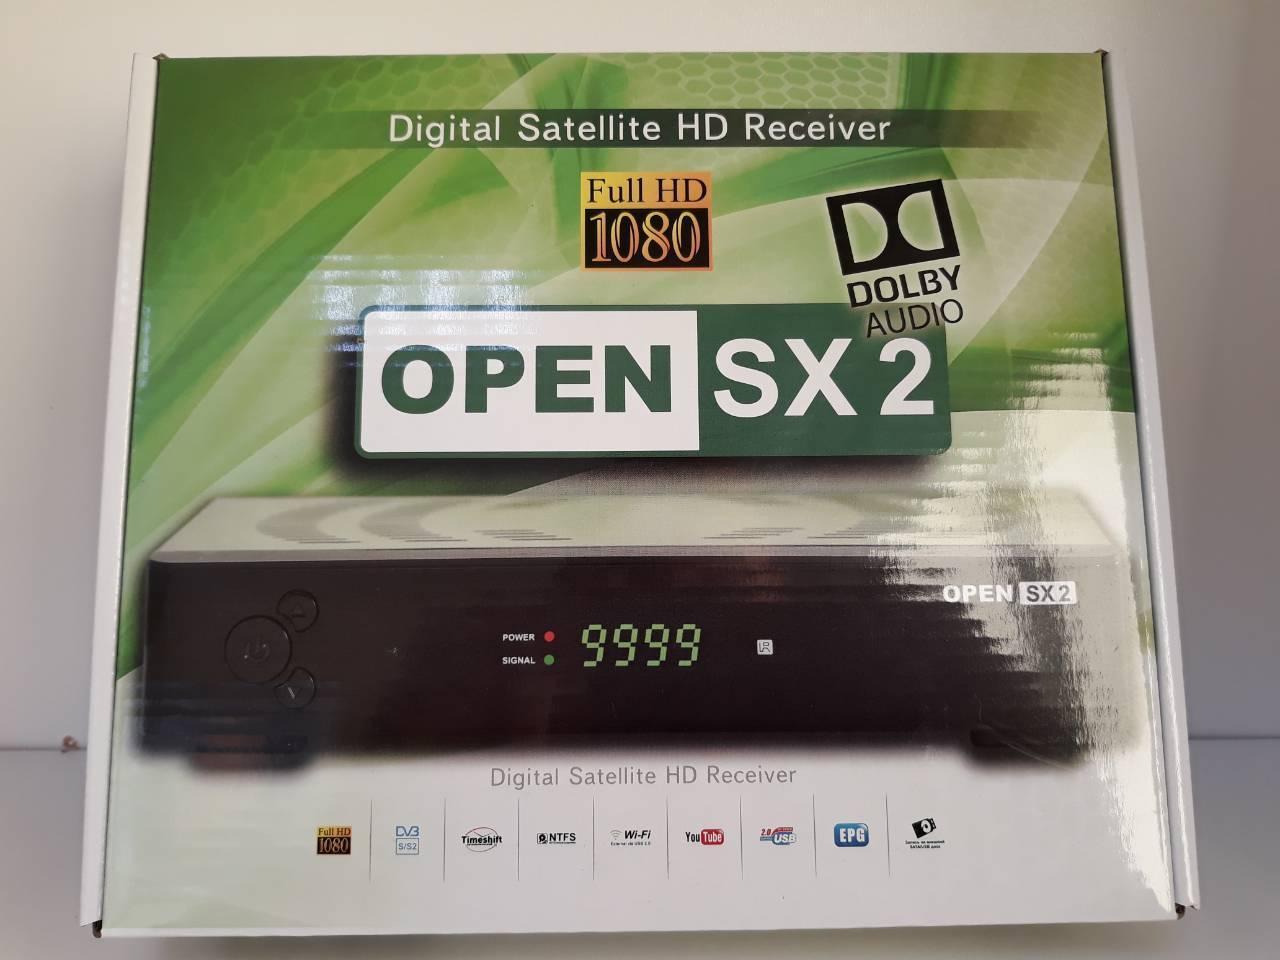 Openbox SX2 HD DOLBY AUDIO (спутниковый тюнер HD)